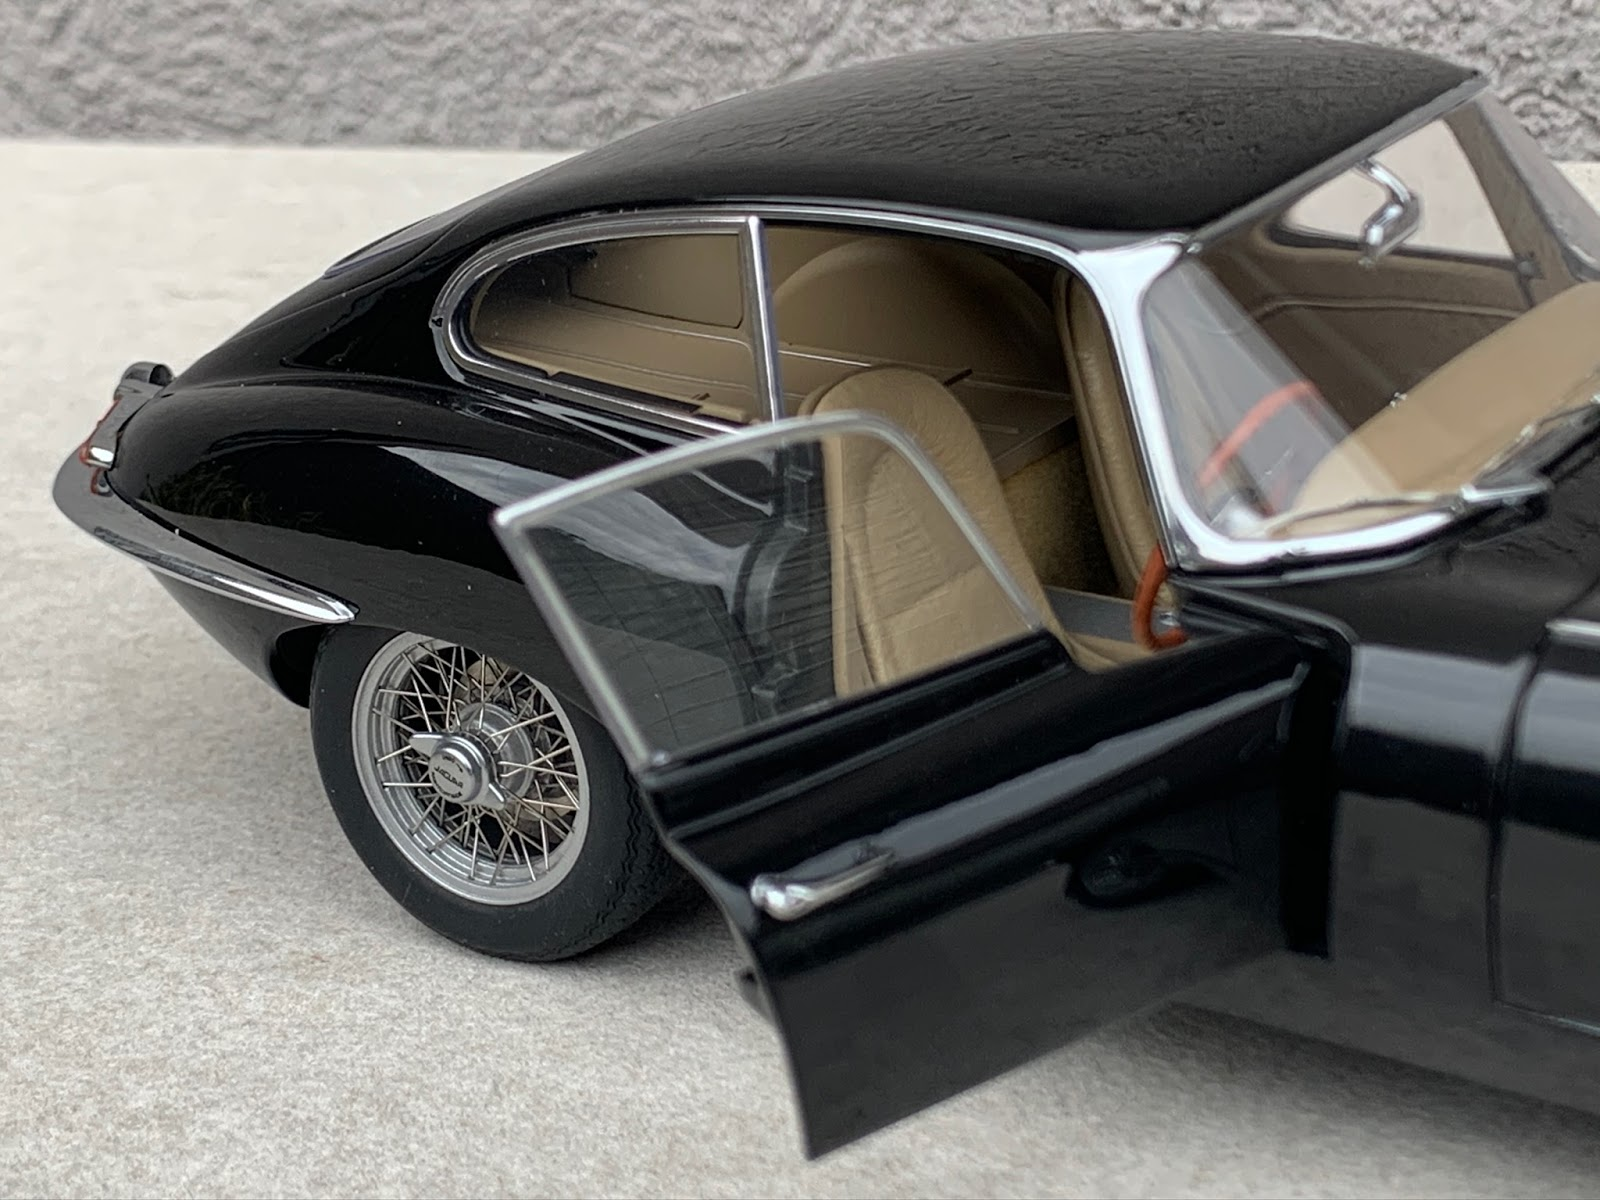 Jaguar E-Type Filtro de aire ronda serie 1 serie 1961-1968 2 1968-1971 Nuevo